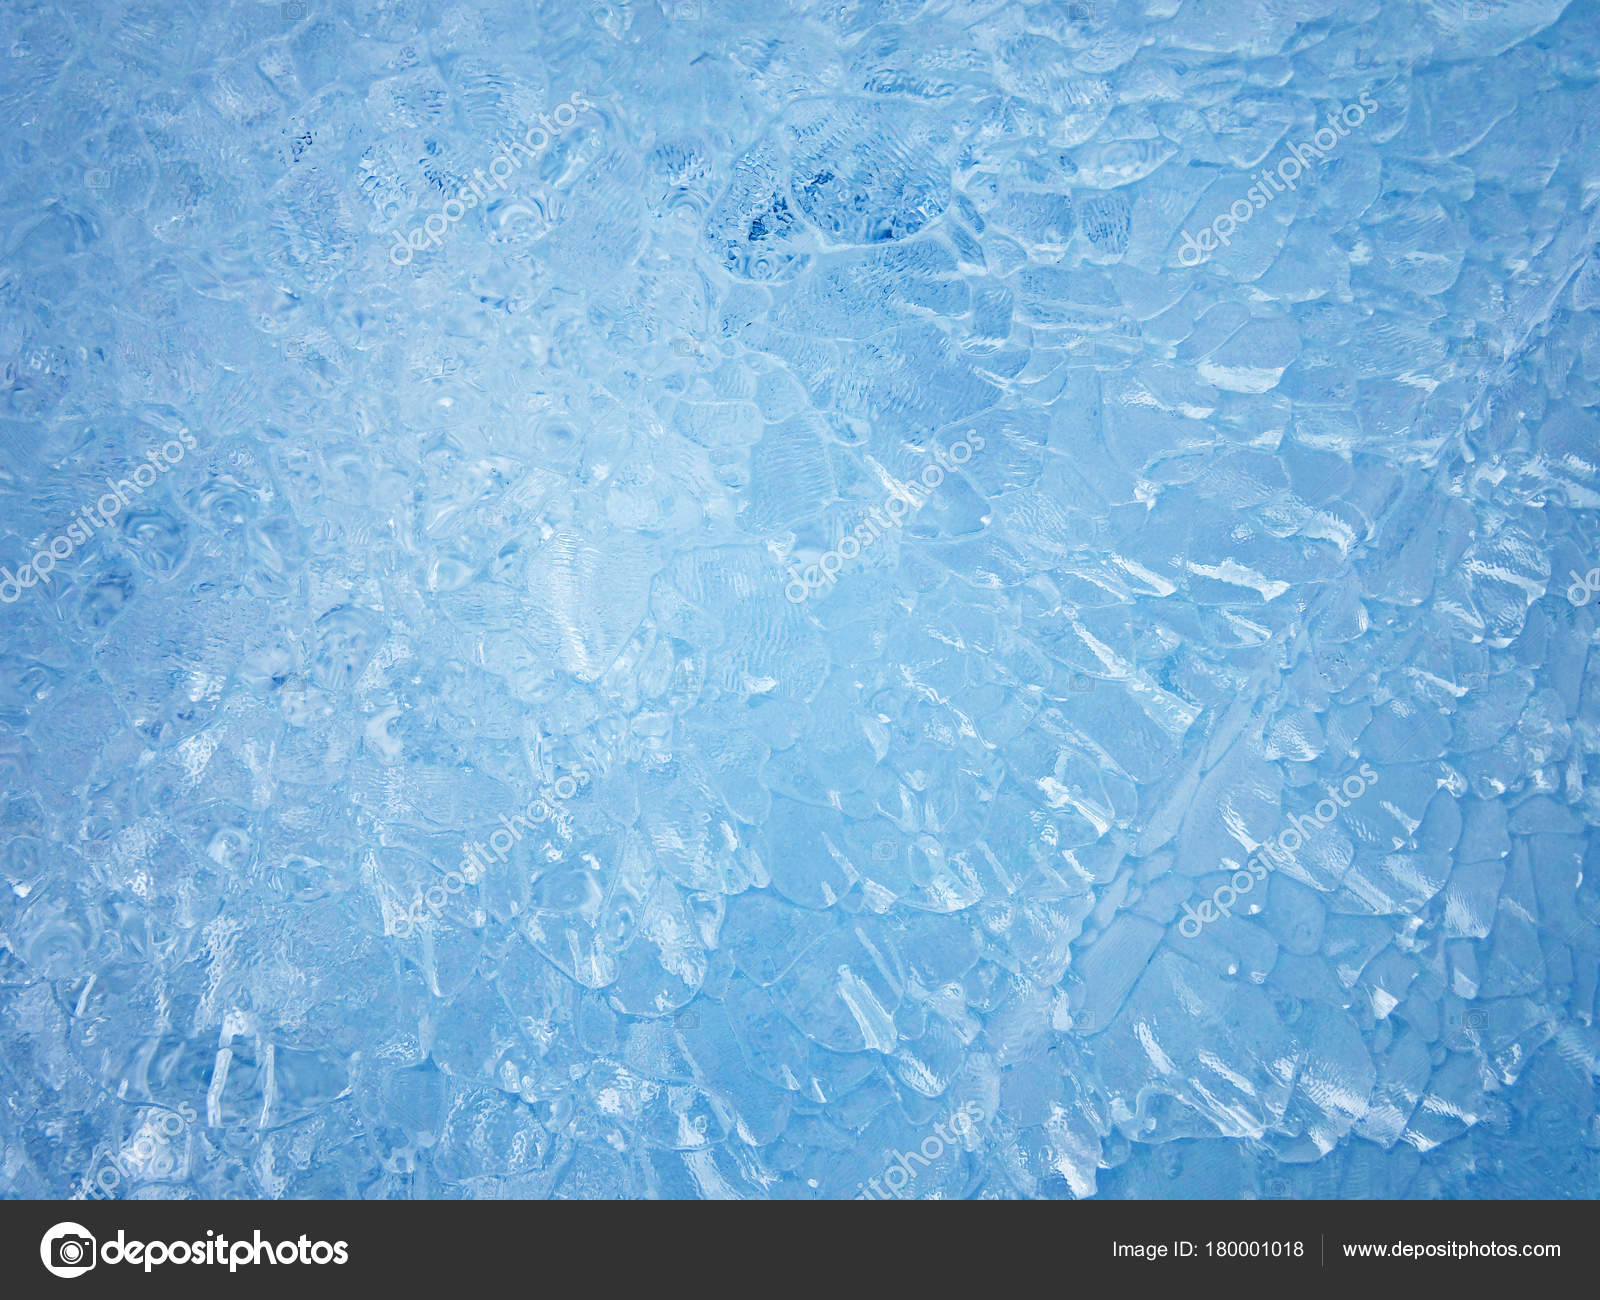 Blue ice. Abstract ice texture. — Stock Photo © slay19 #180001018